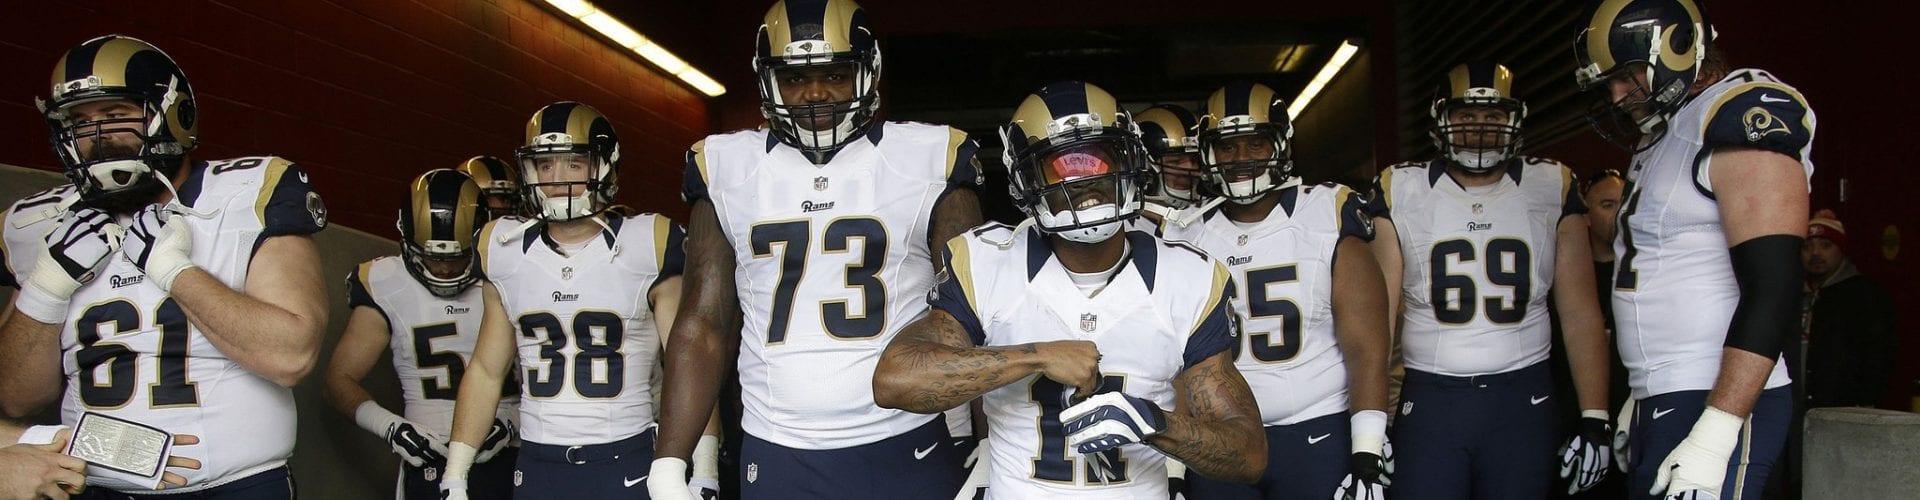 Rams, Cowboys Preseason Game Tops Thursday Best-Sellers